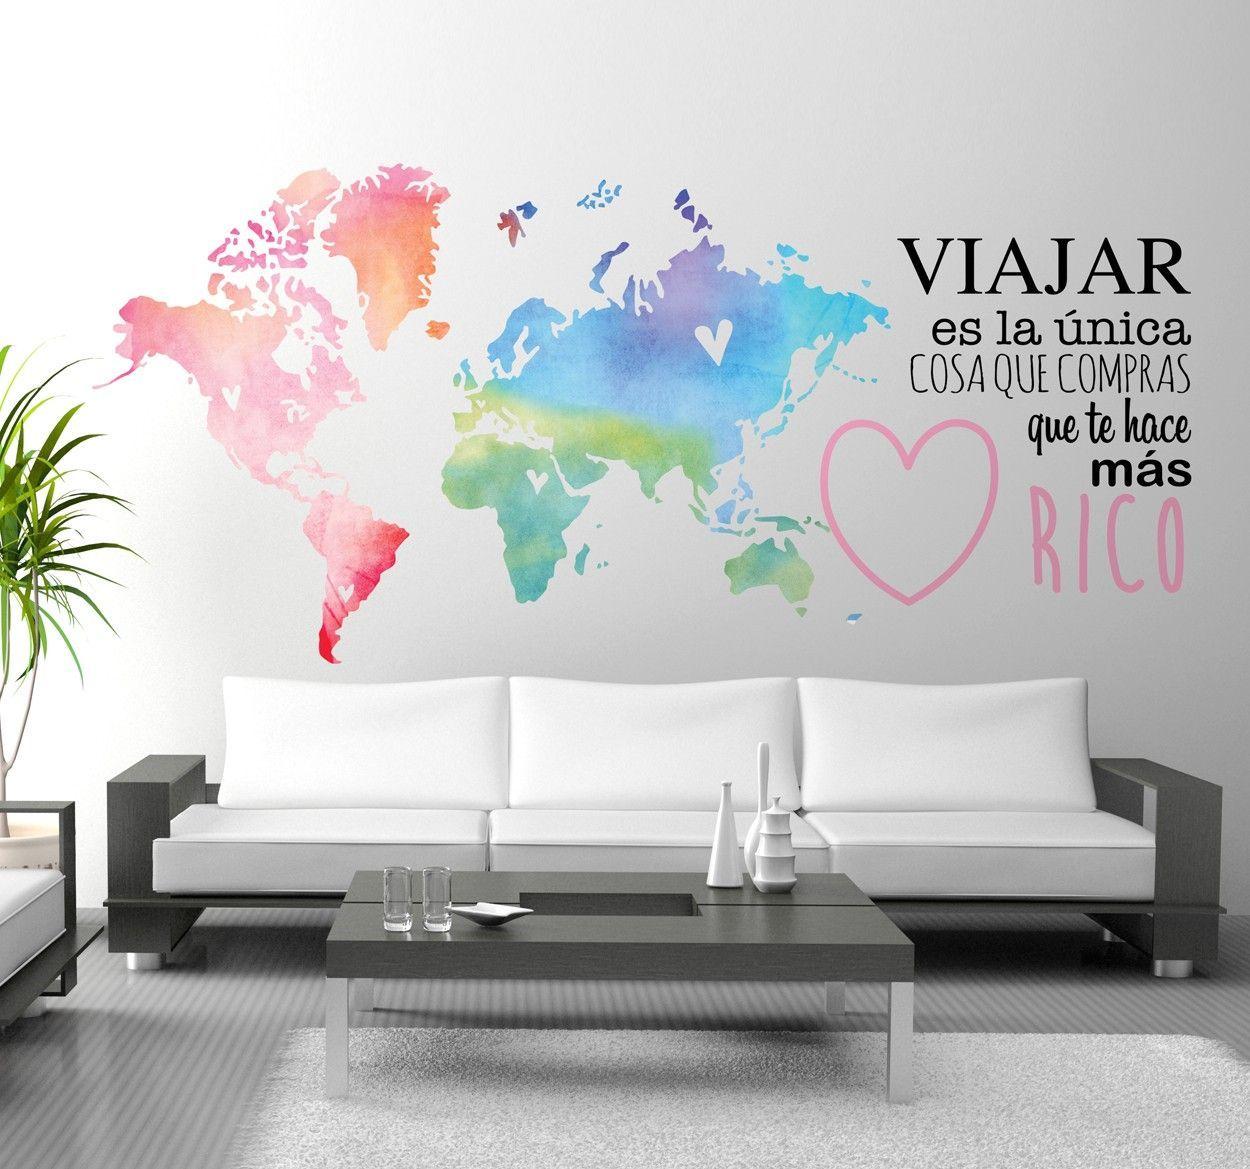 Vinilo mapamundi y texto sobre viajar #agenciadeviajes | frases ...